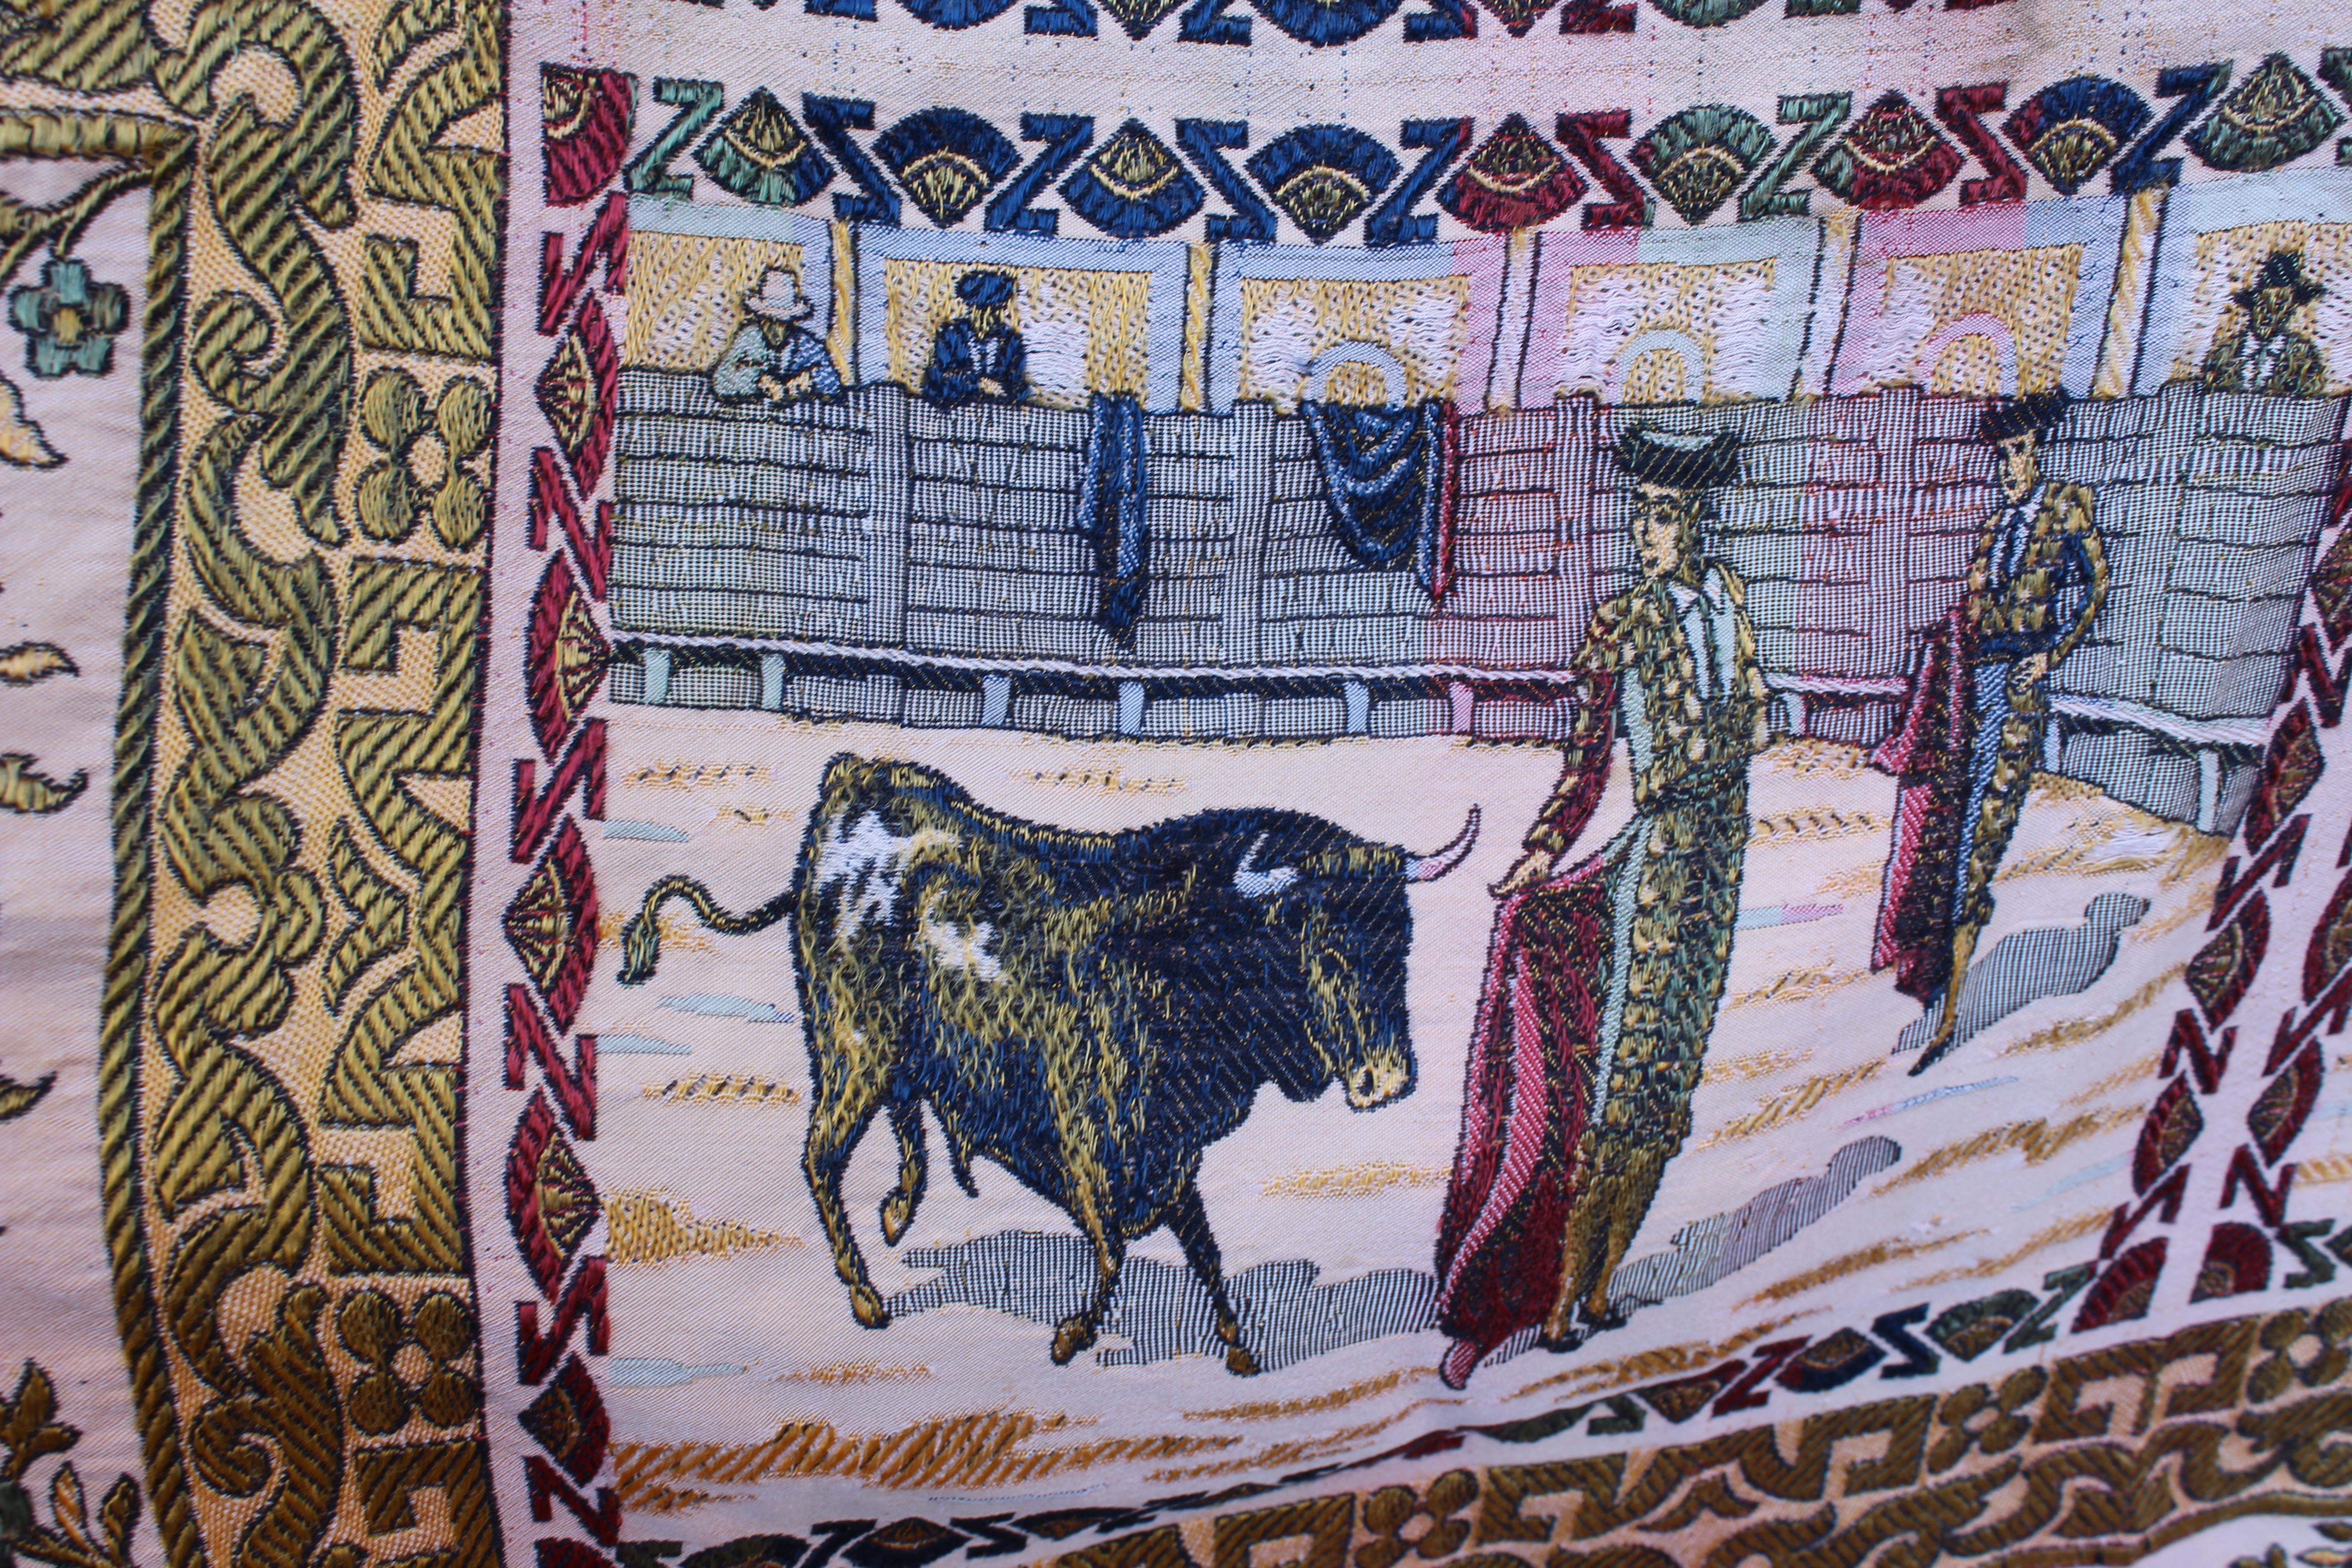 Antigüedades: ANTIGUO MANTEL TAPETE TAPIZ , HILOS DE ALGODÓN Y SEDA ESCENA TOREROS TOROS PLAZAS - Foto 5 - 108437623